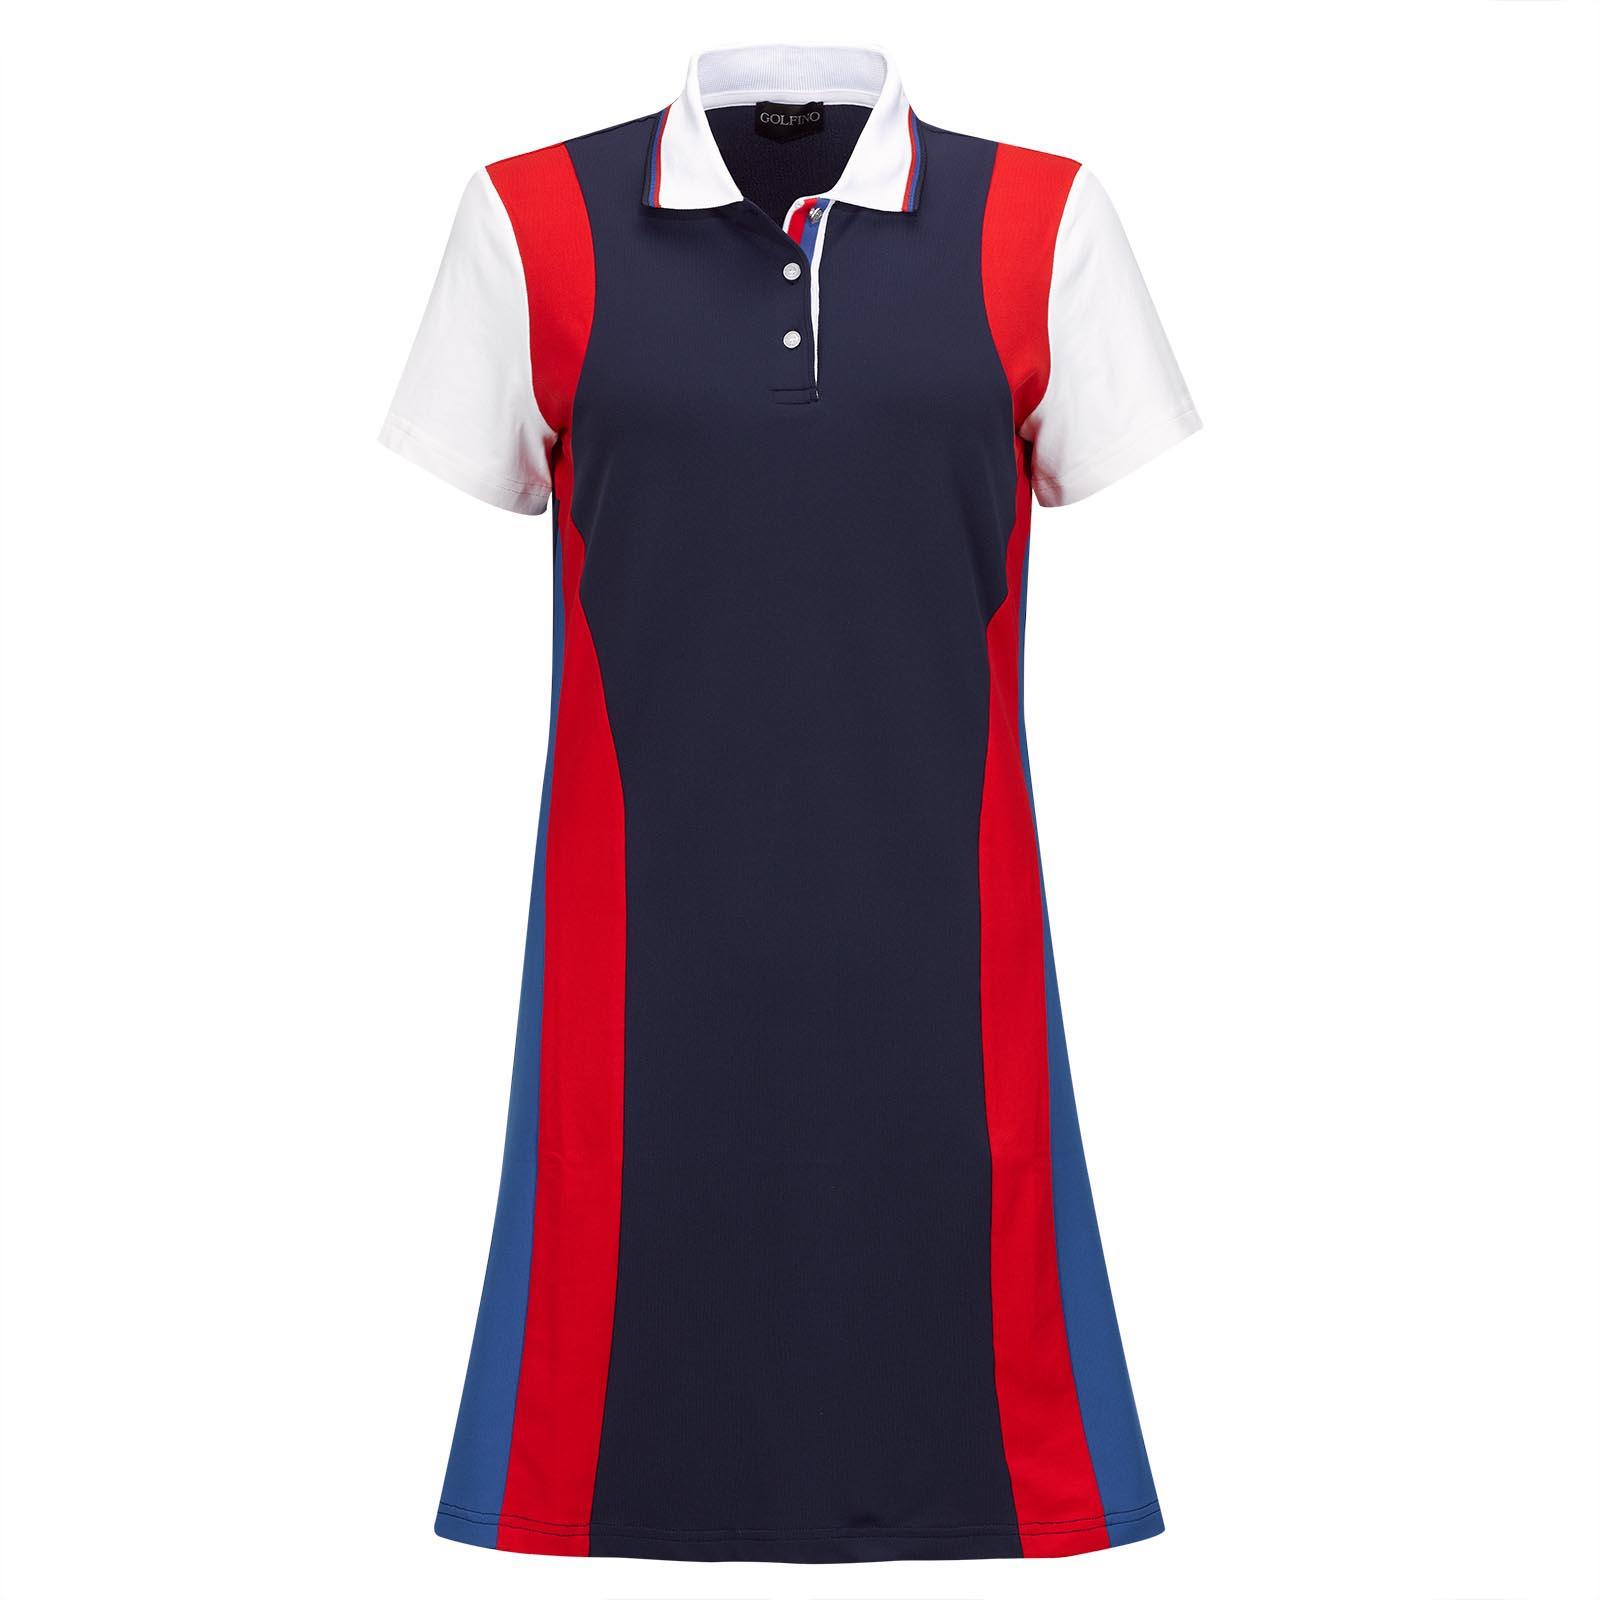 Kurzarm Damen Funktions-Golfkleid im Retro Look mit Sun Protection